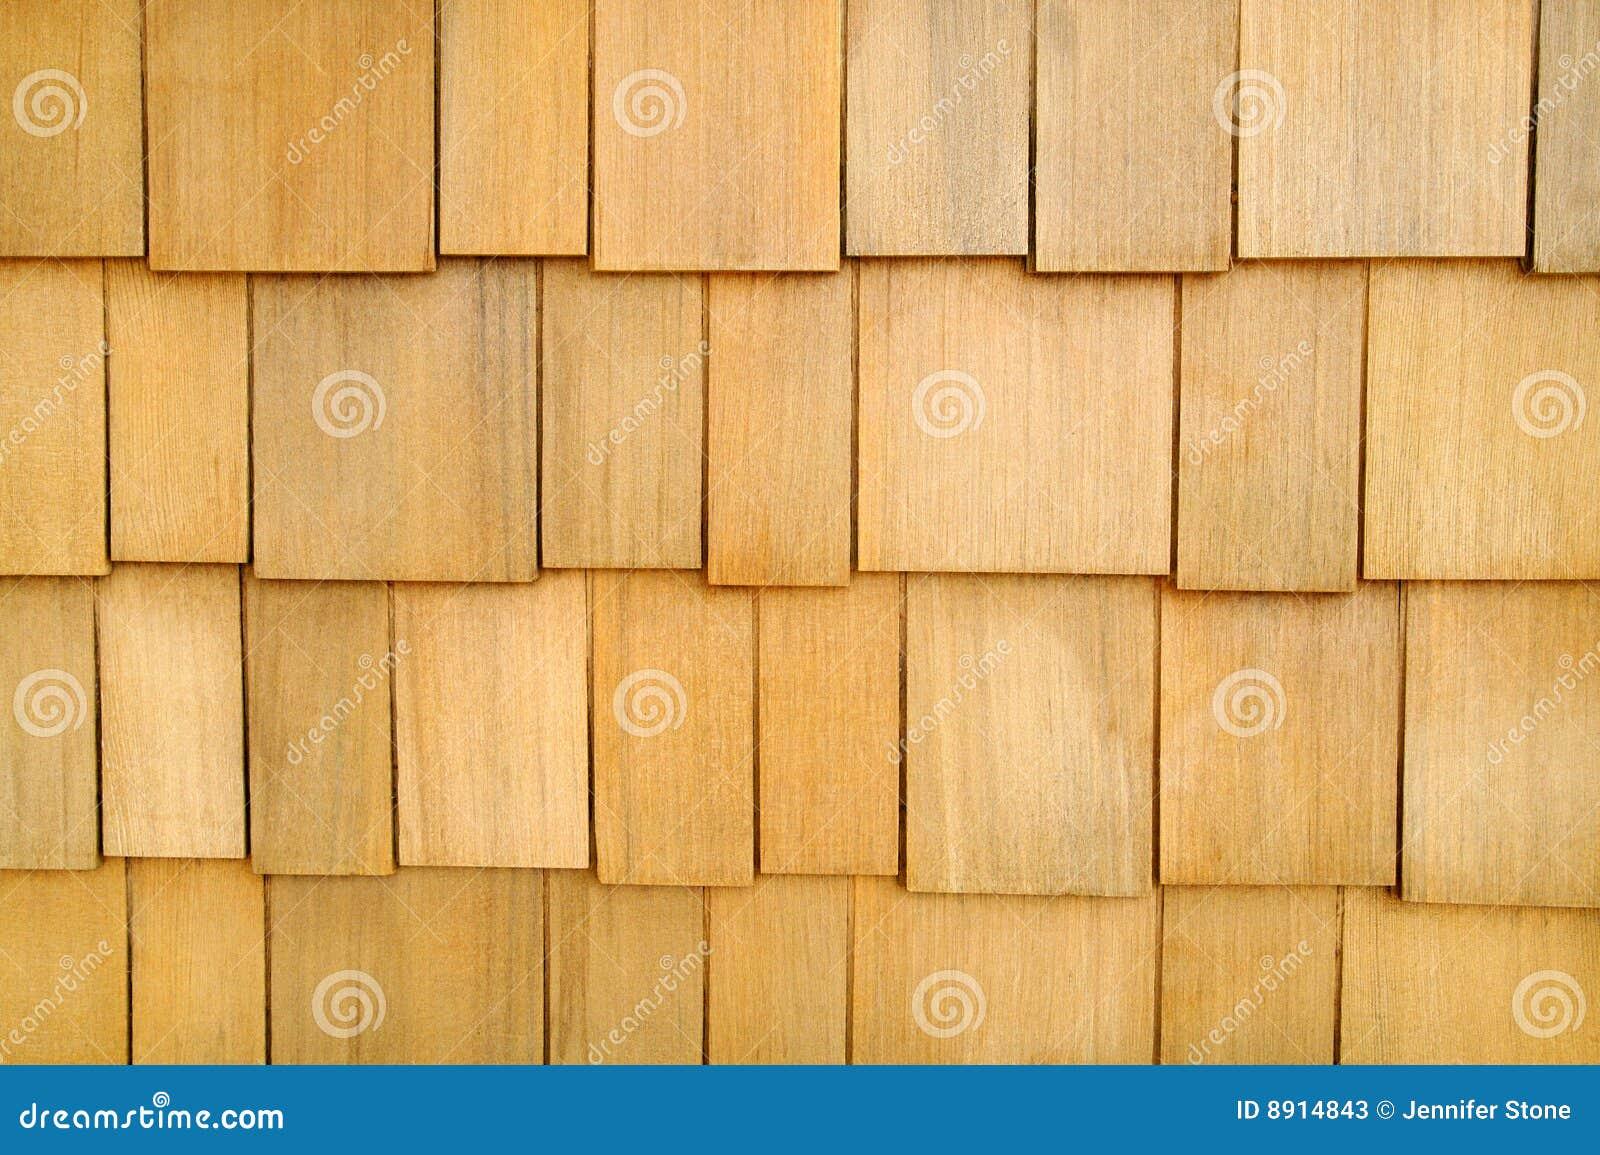 Wooden Shingle Wall Background Stock Photos Image 8914843